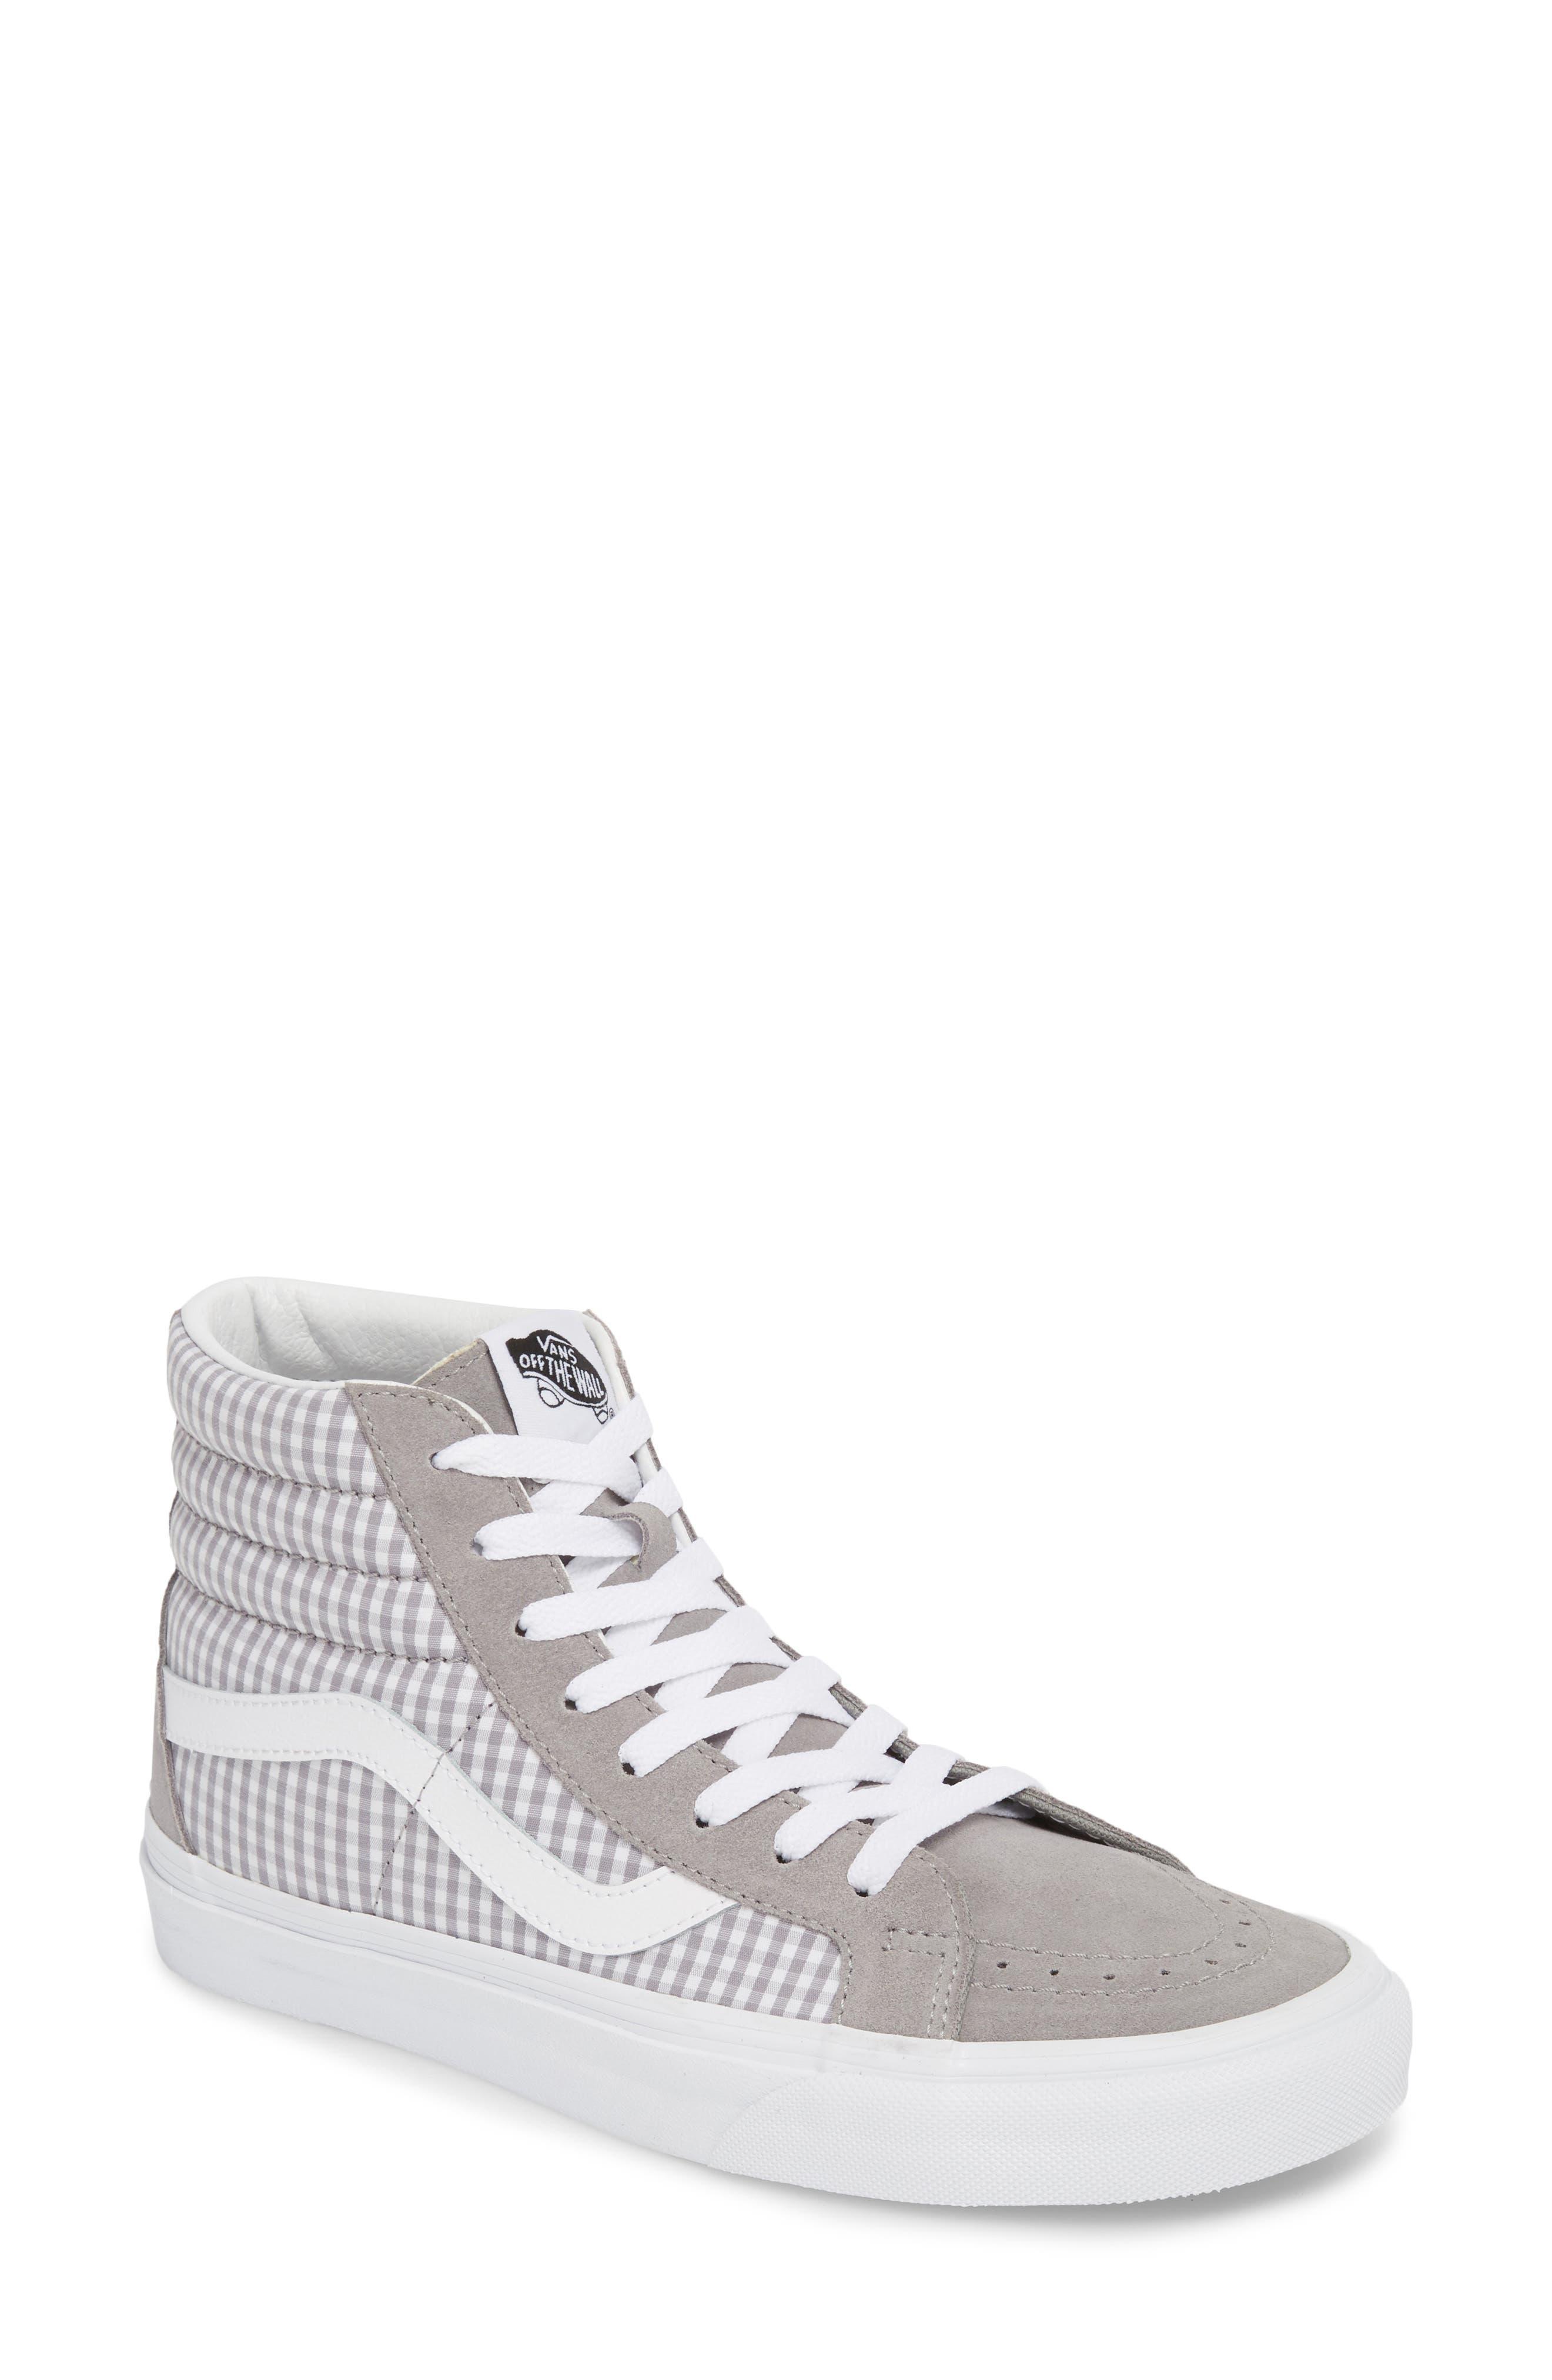 'Sk8-Hi Reissue' Sneaker,                             Main thumbnail 1, color,                             Titanium/ True White